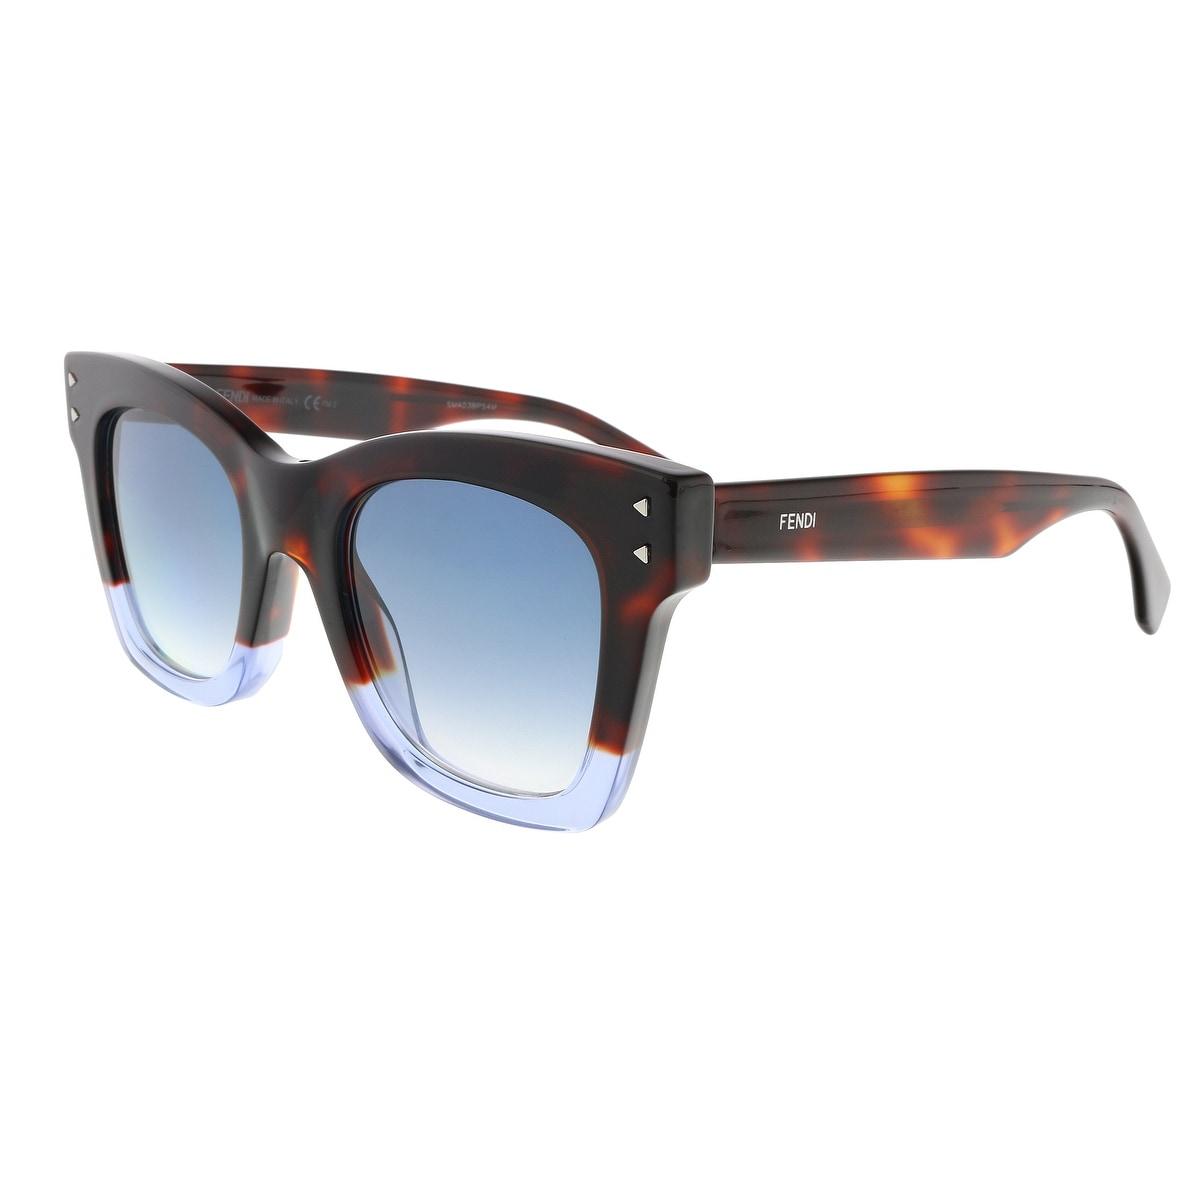 7e099bffe8 Fendi Sunglasses